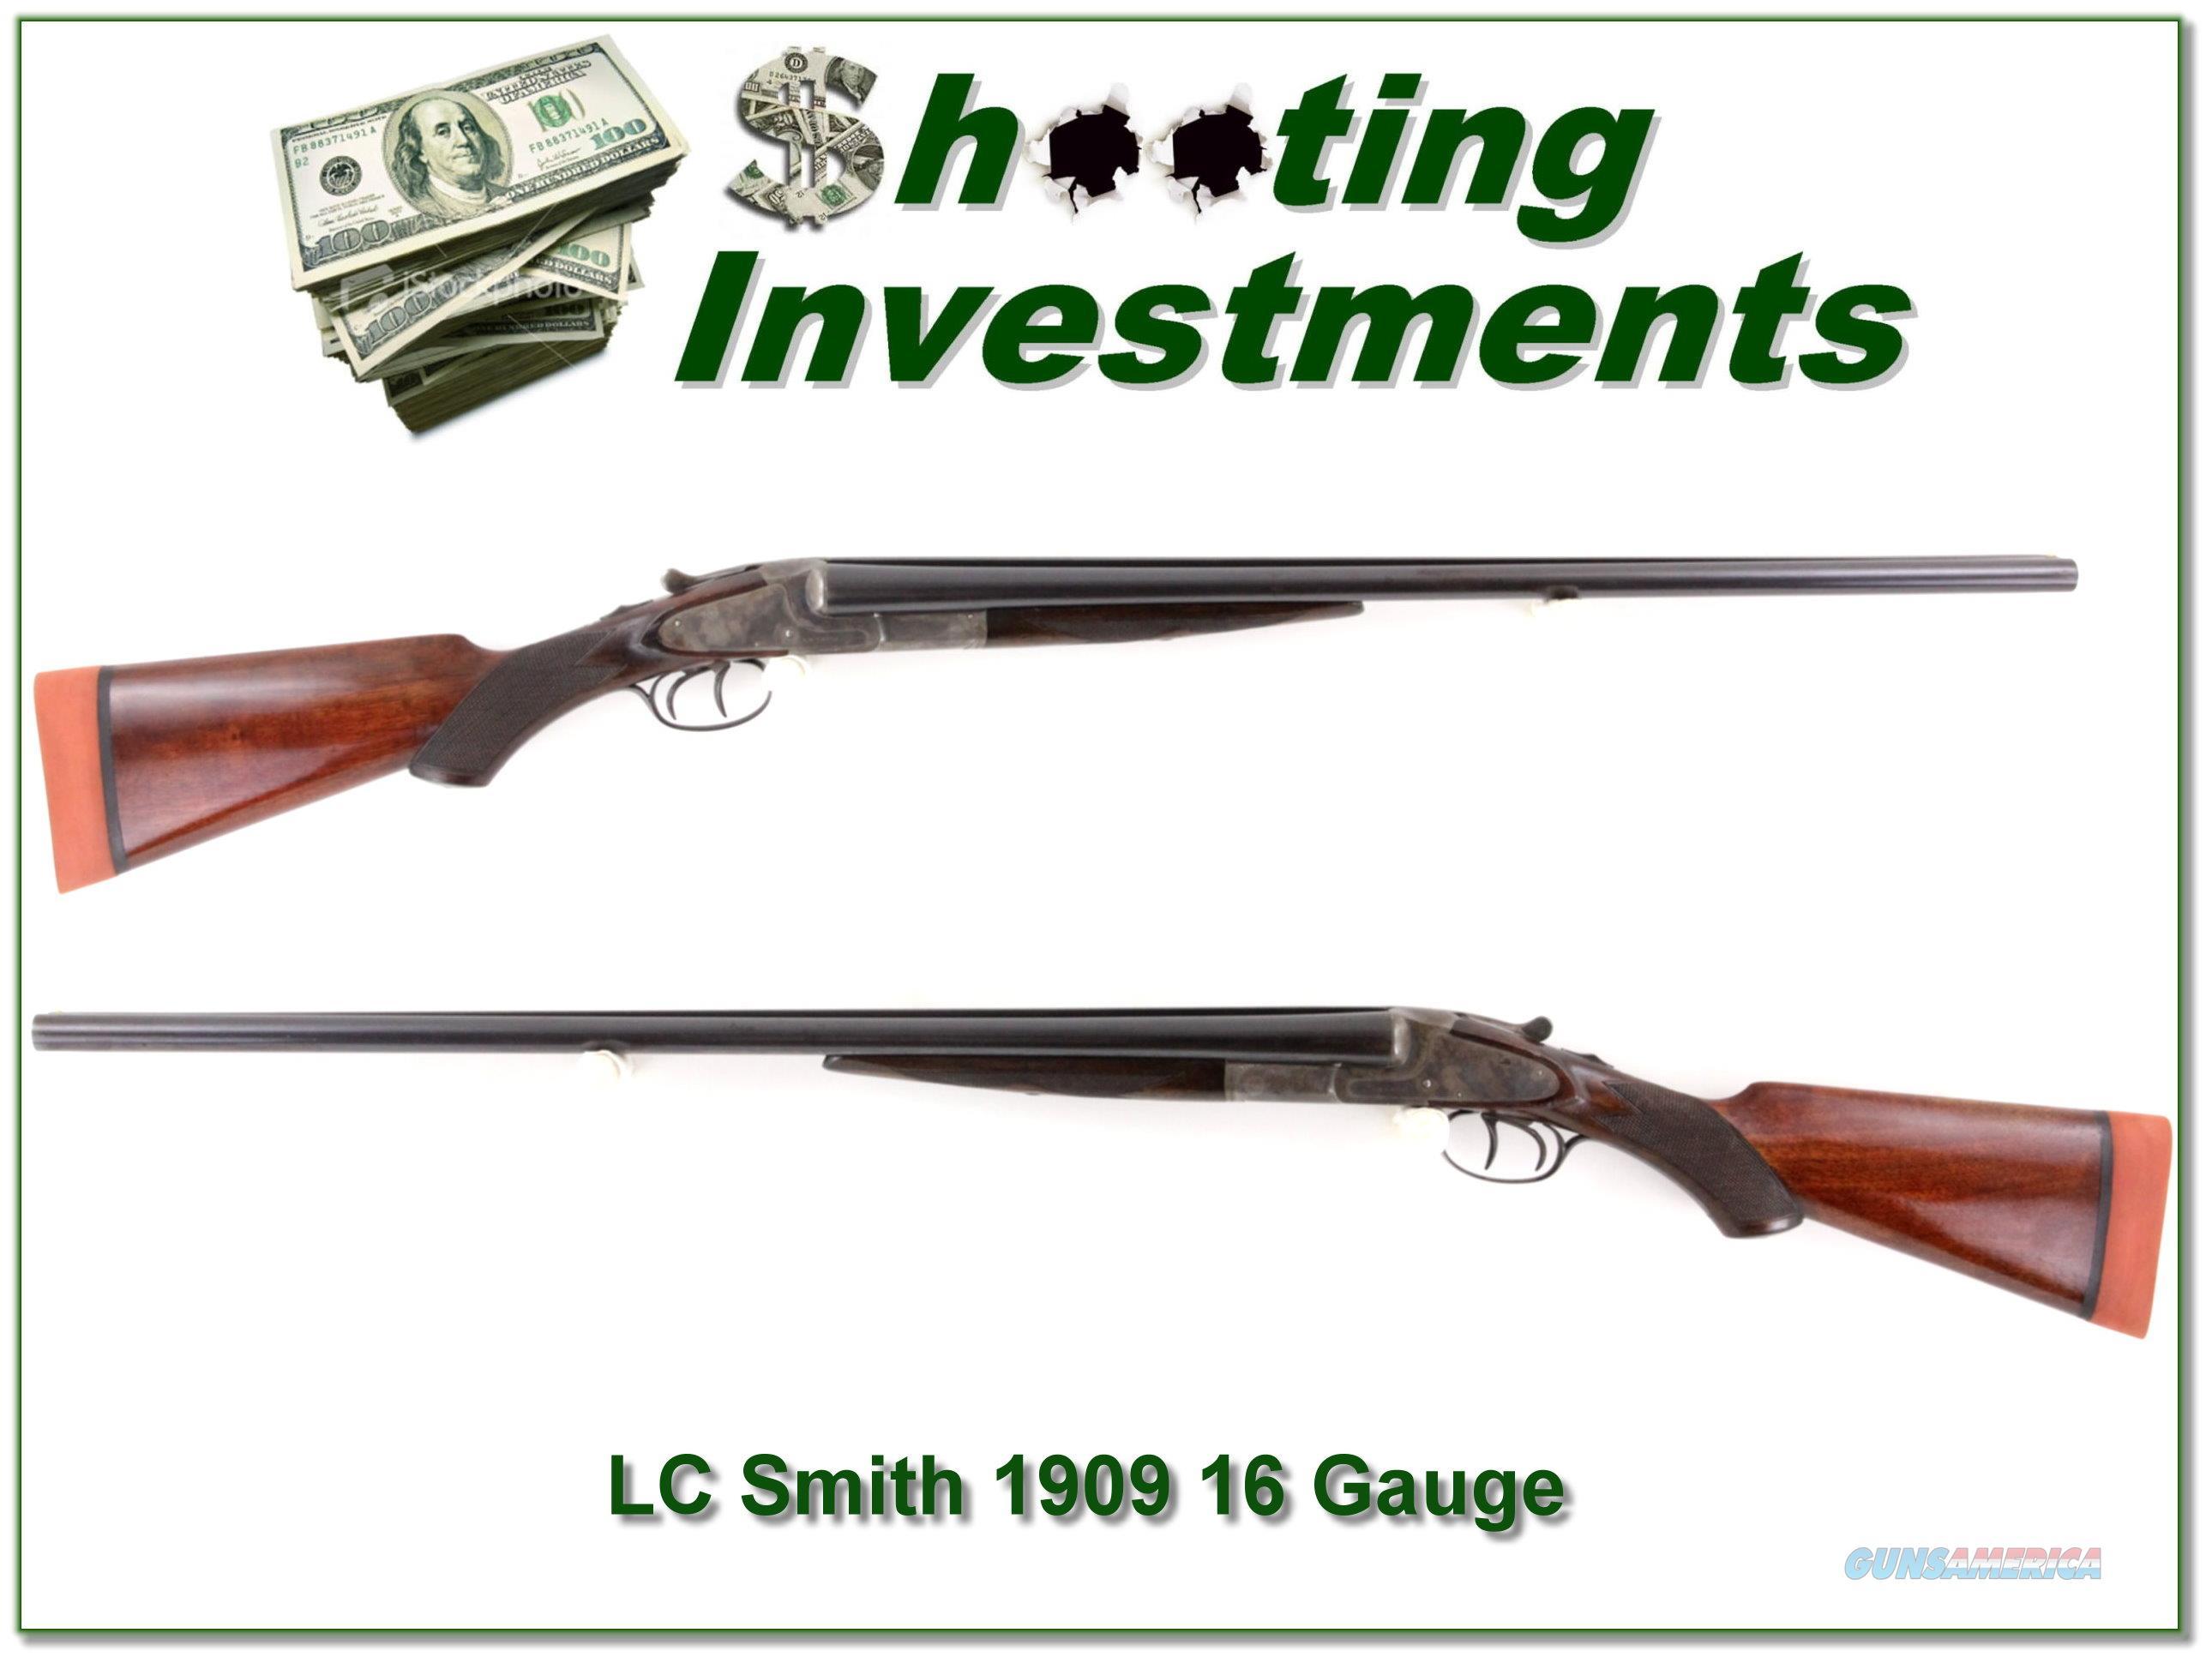 LC Smith O Model 16 Guage 1909 made  Guns > Shotguns > L.C. Smith Shotguns